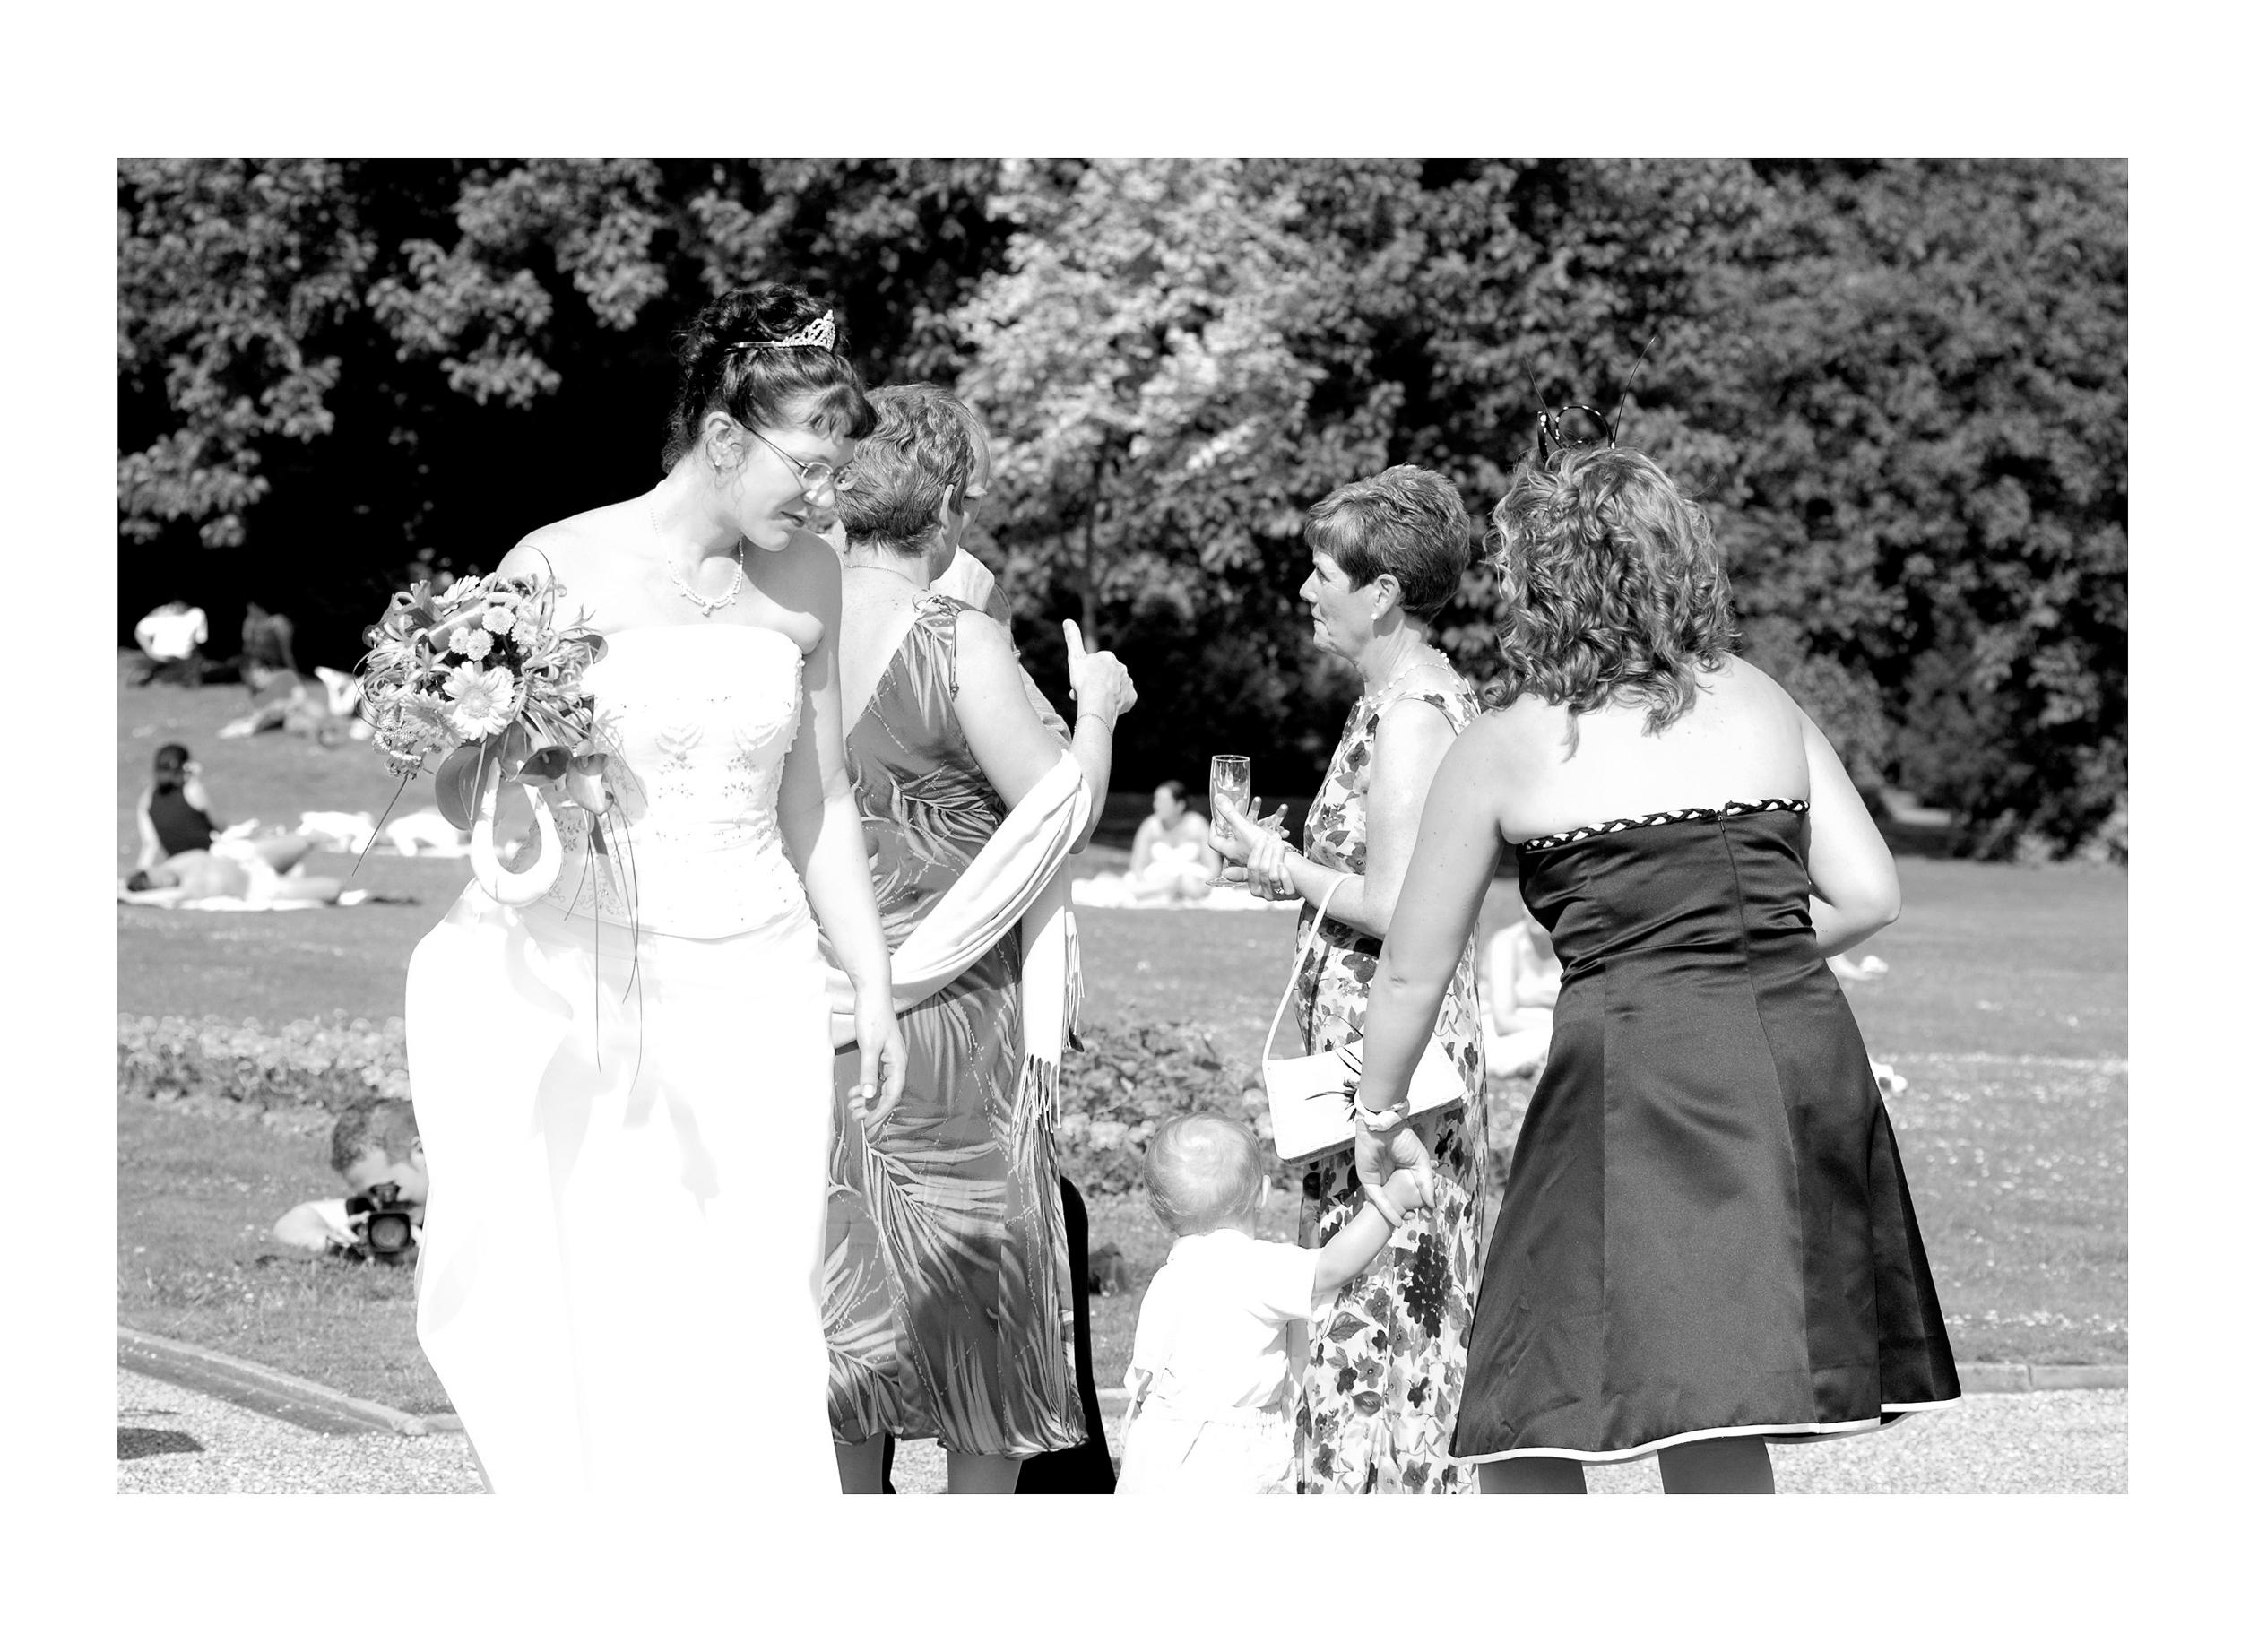 REPORTAGE-WEDDING-PHOTOGRAPHY-SET-UK-30.jpg